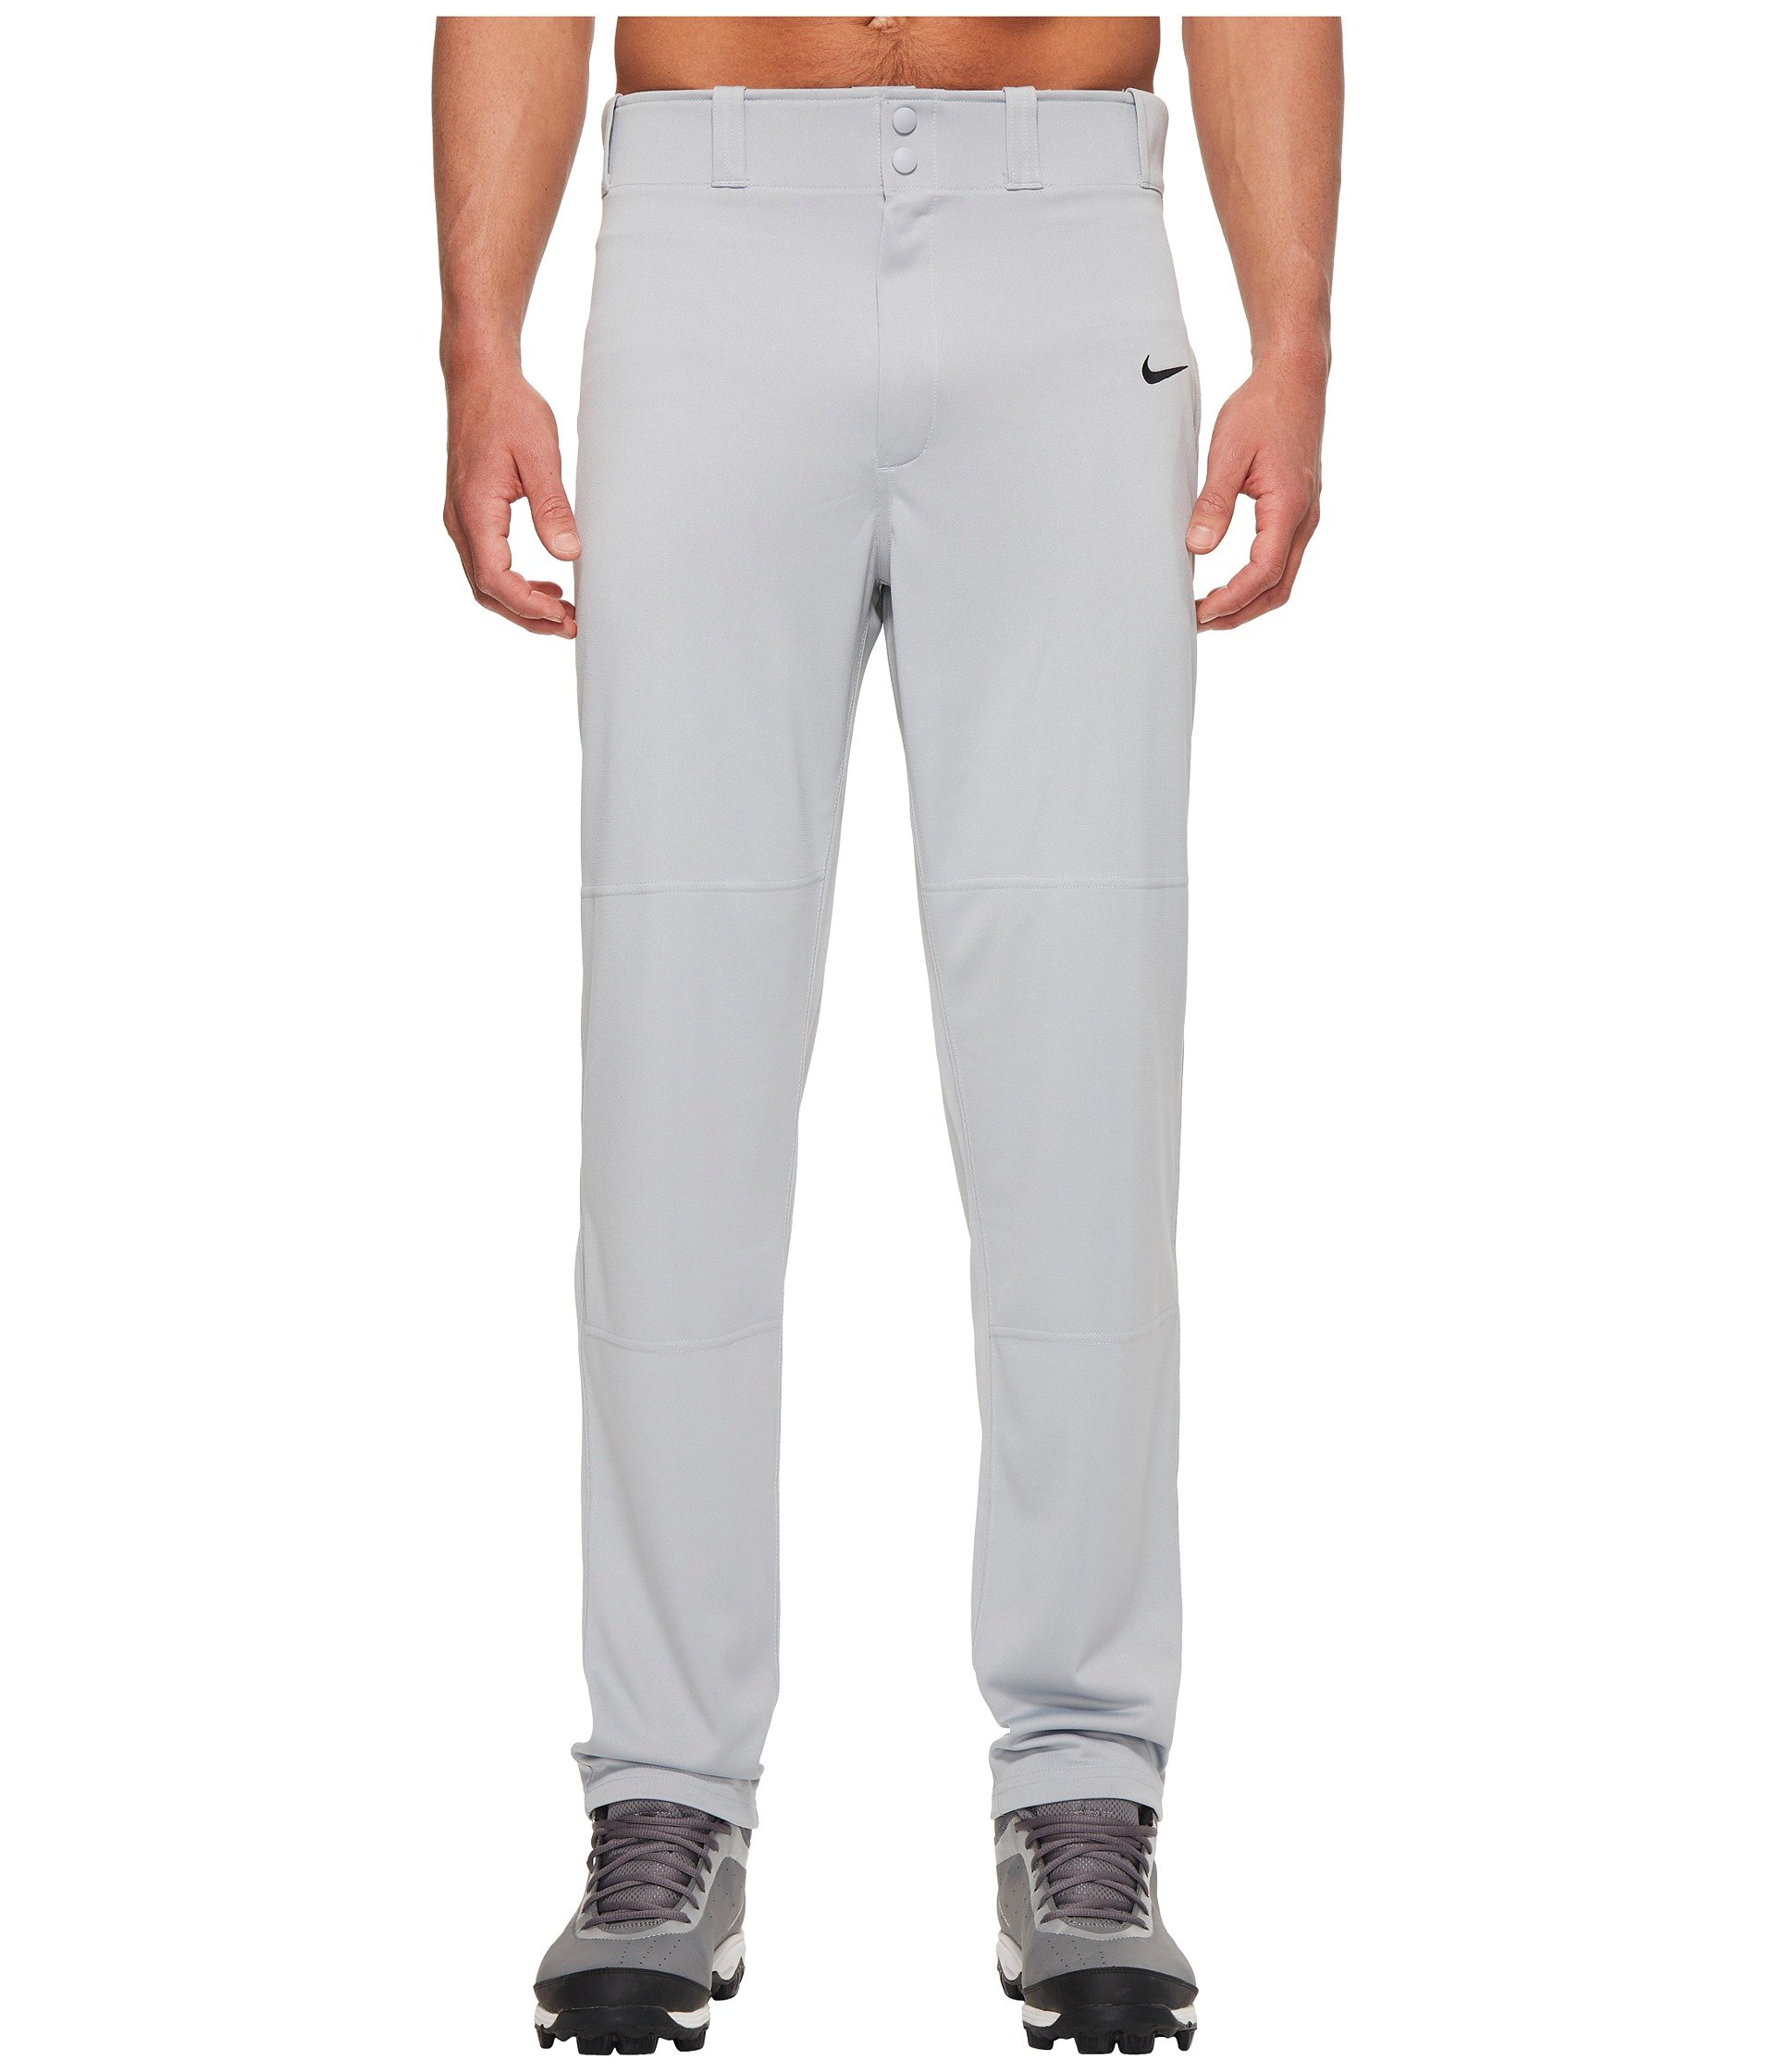 Nike Men's Core Dri Fit Open Hem Baseball Pant Blue Grey/Black Size Small by Nike (Image #1)